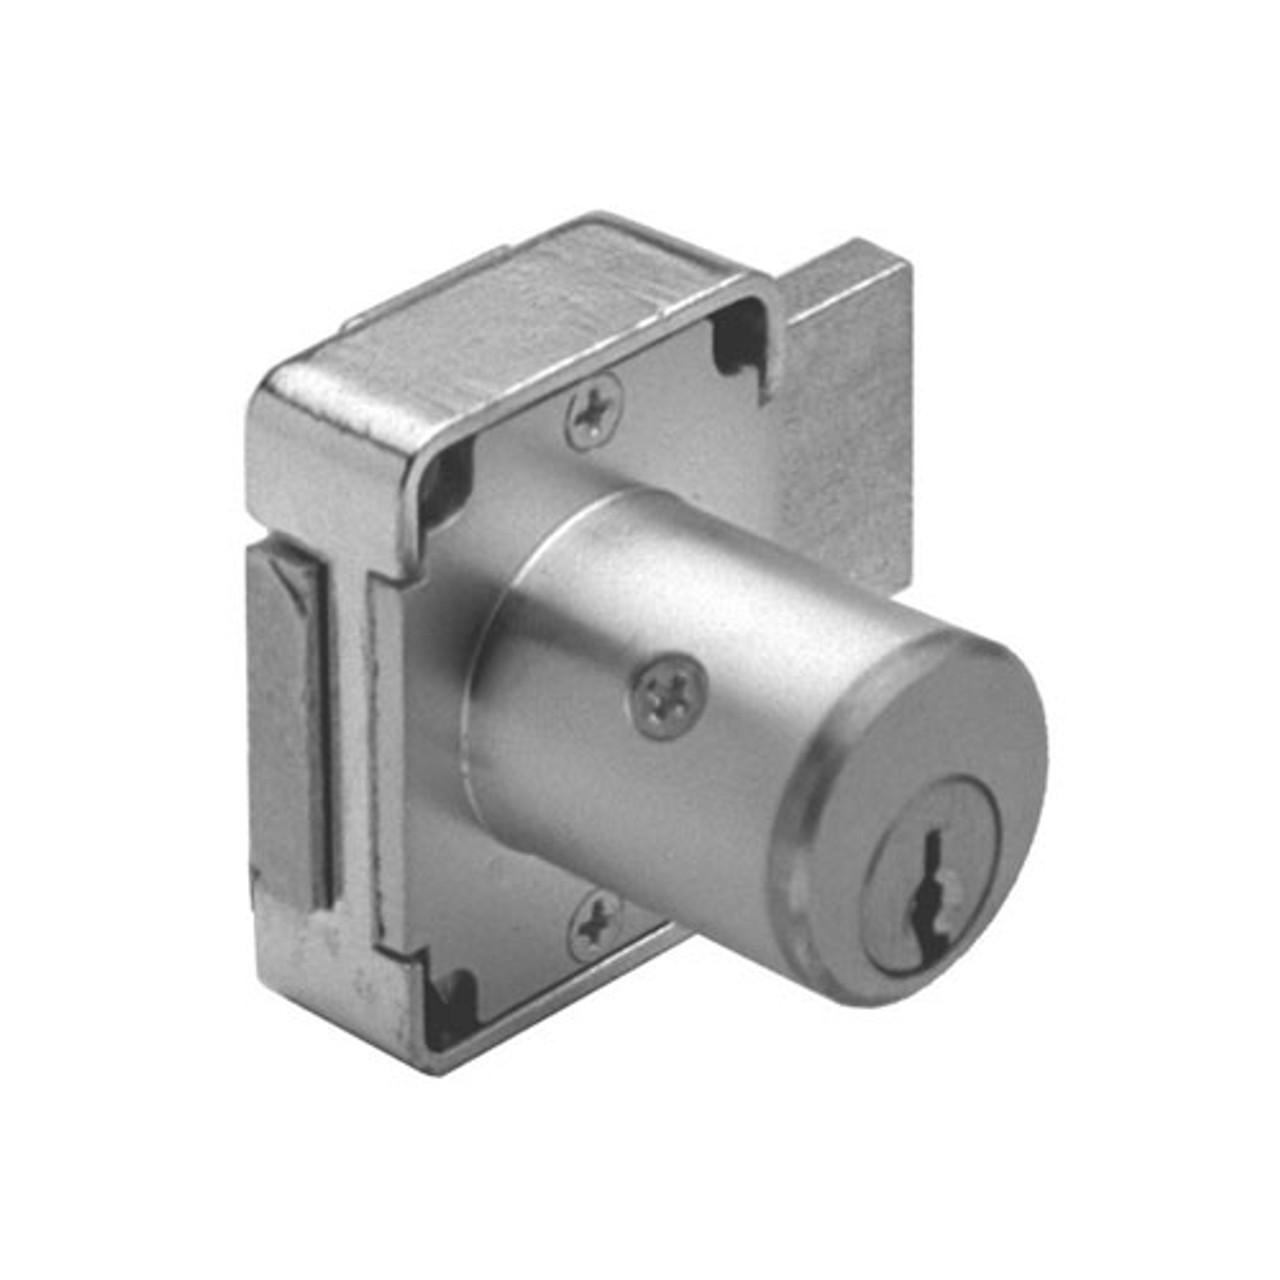 Olympus 500DR-KA4T2-26D-1-3/8 Deadbolt Locks in Satin Chrome Finish